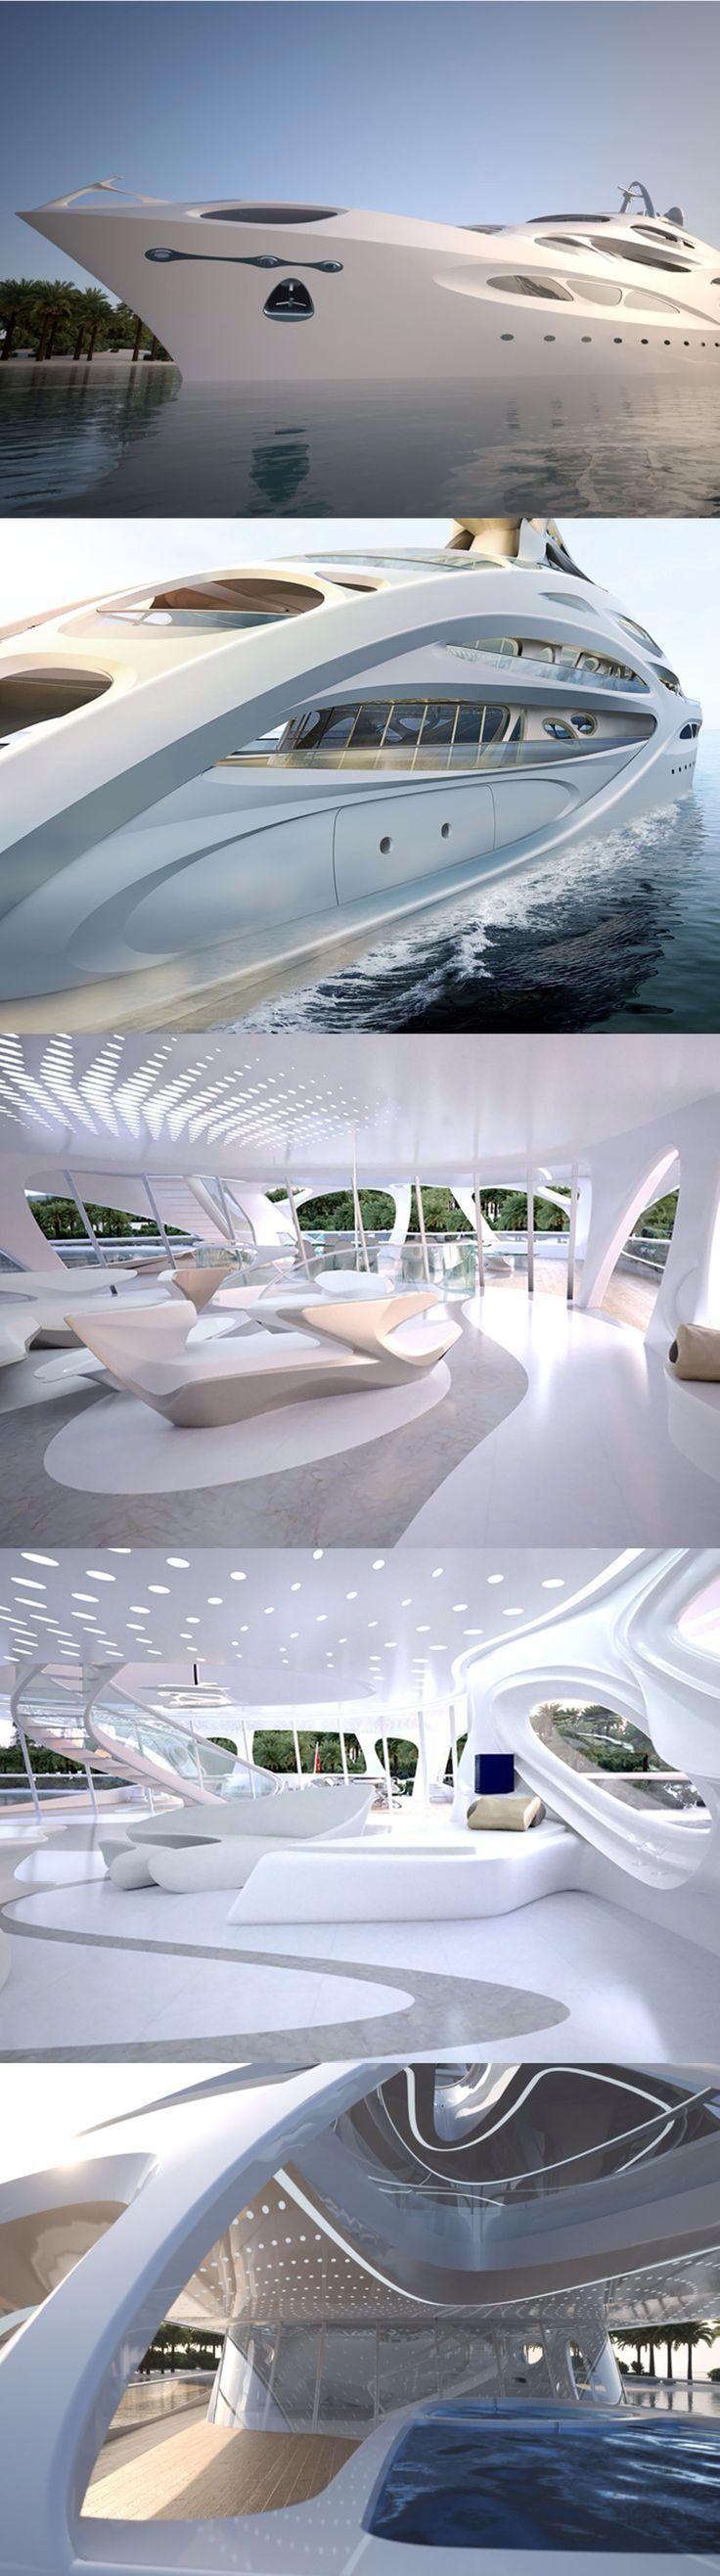 Beautifully furnished yacht